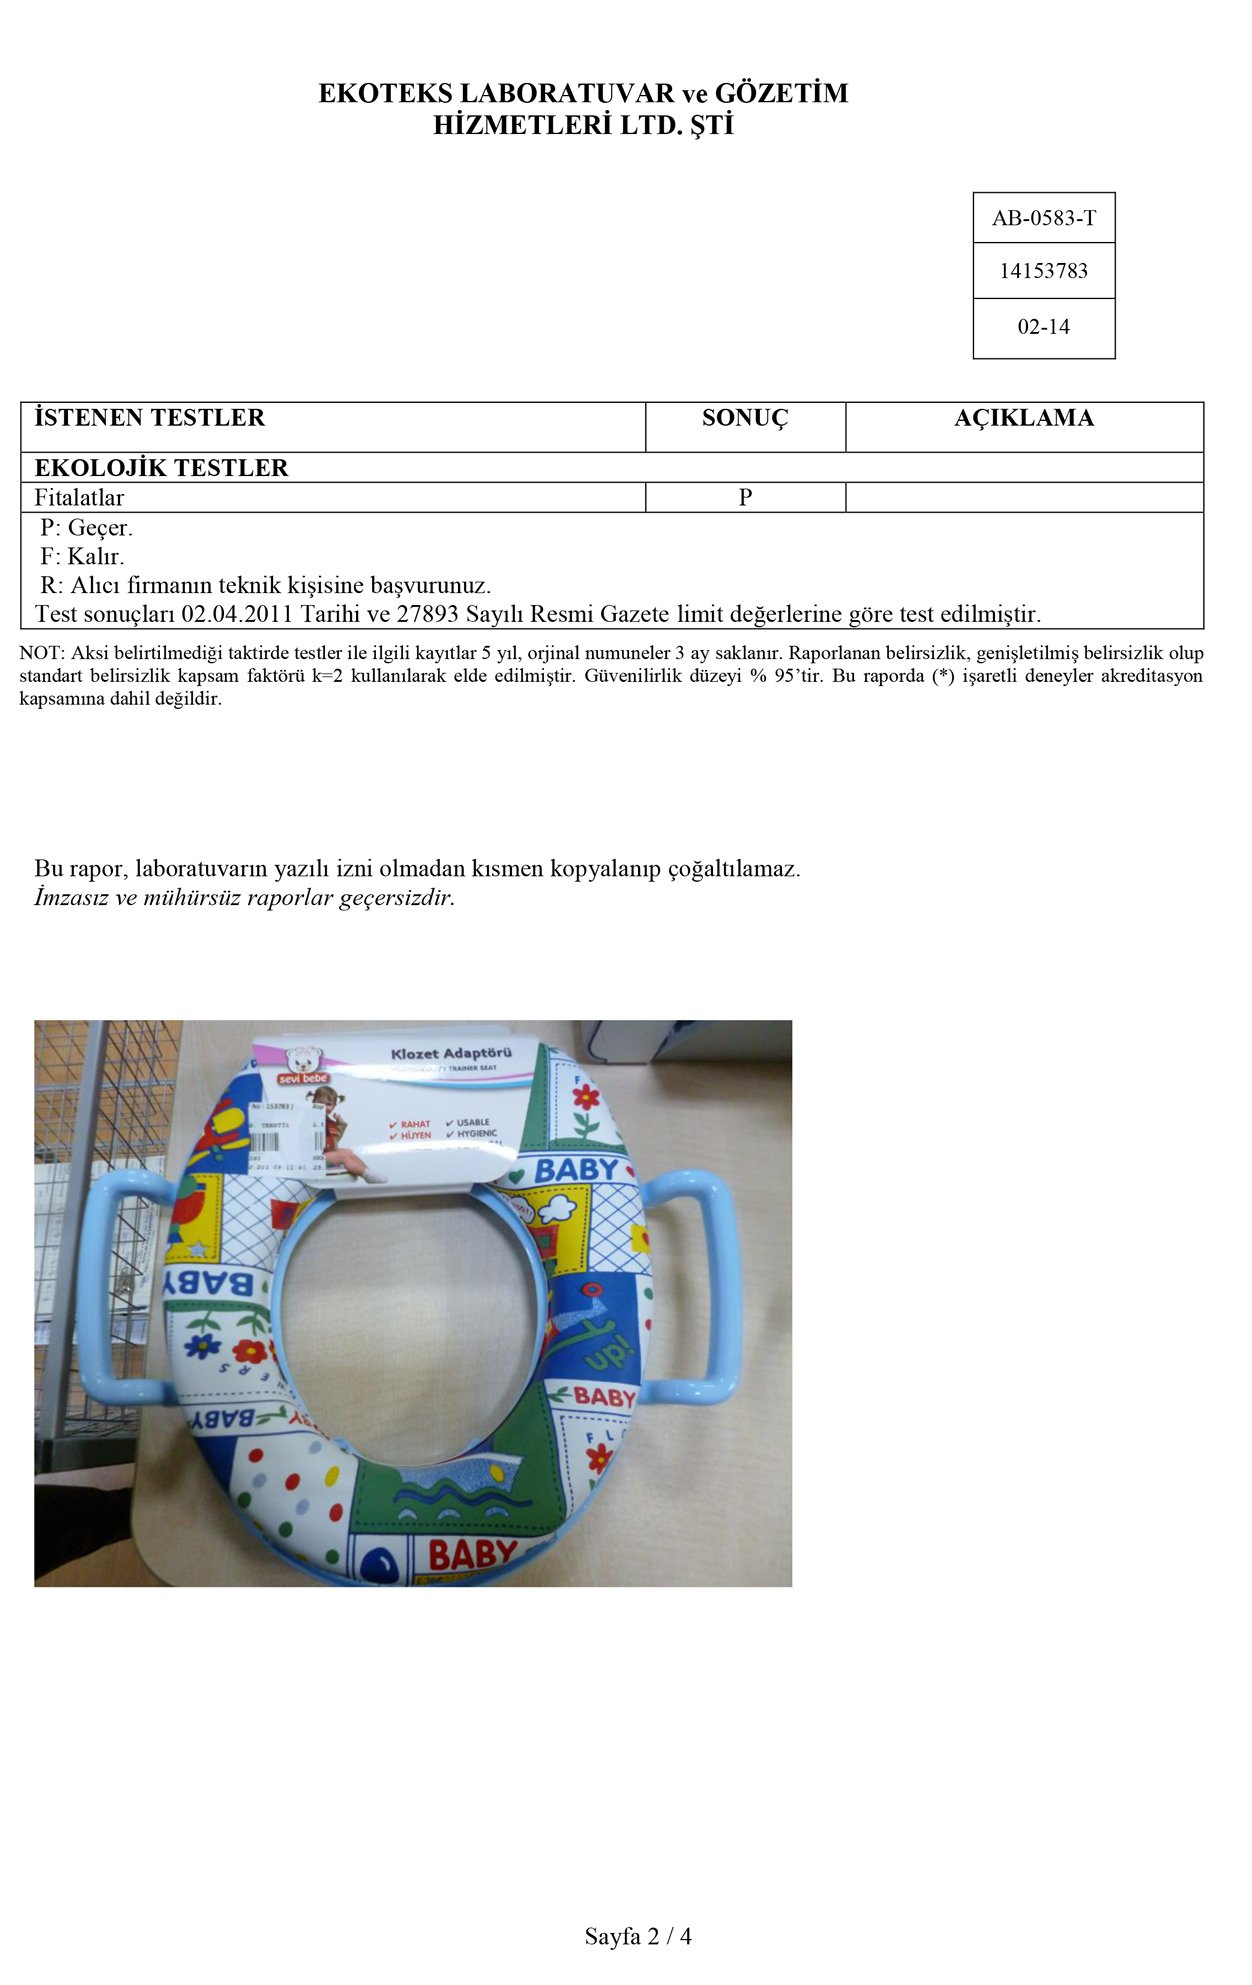 Klozet Adaptörü Test Raporu 2